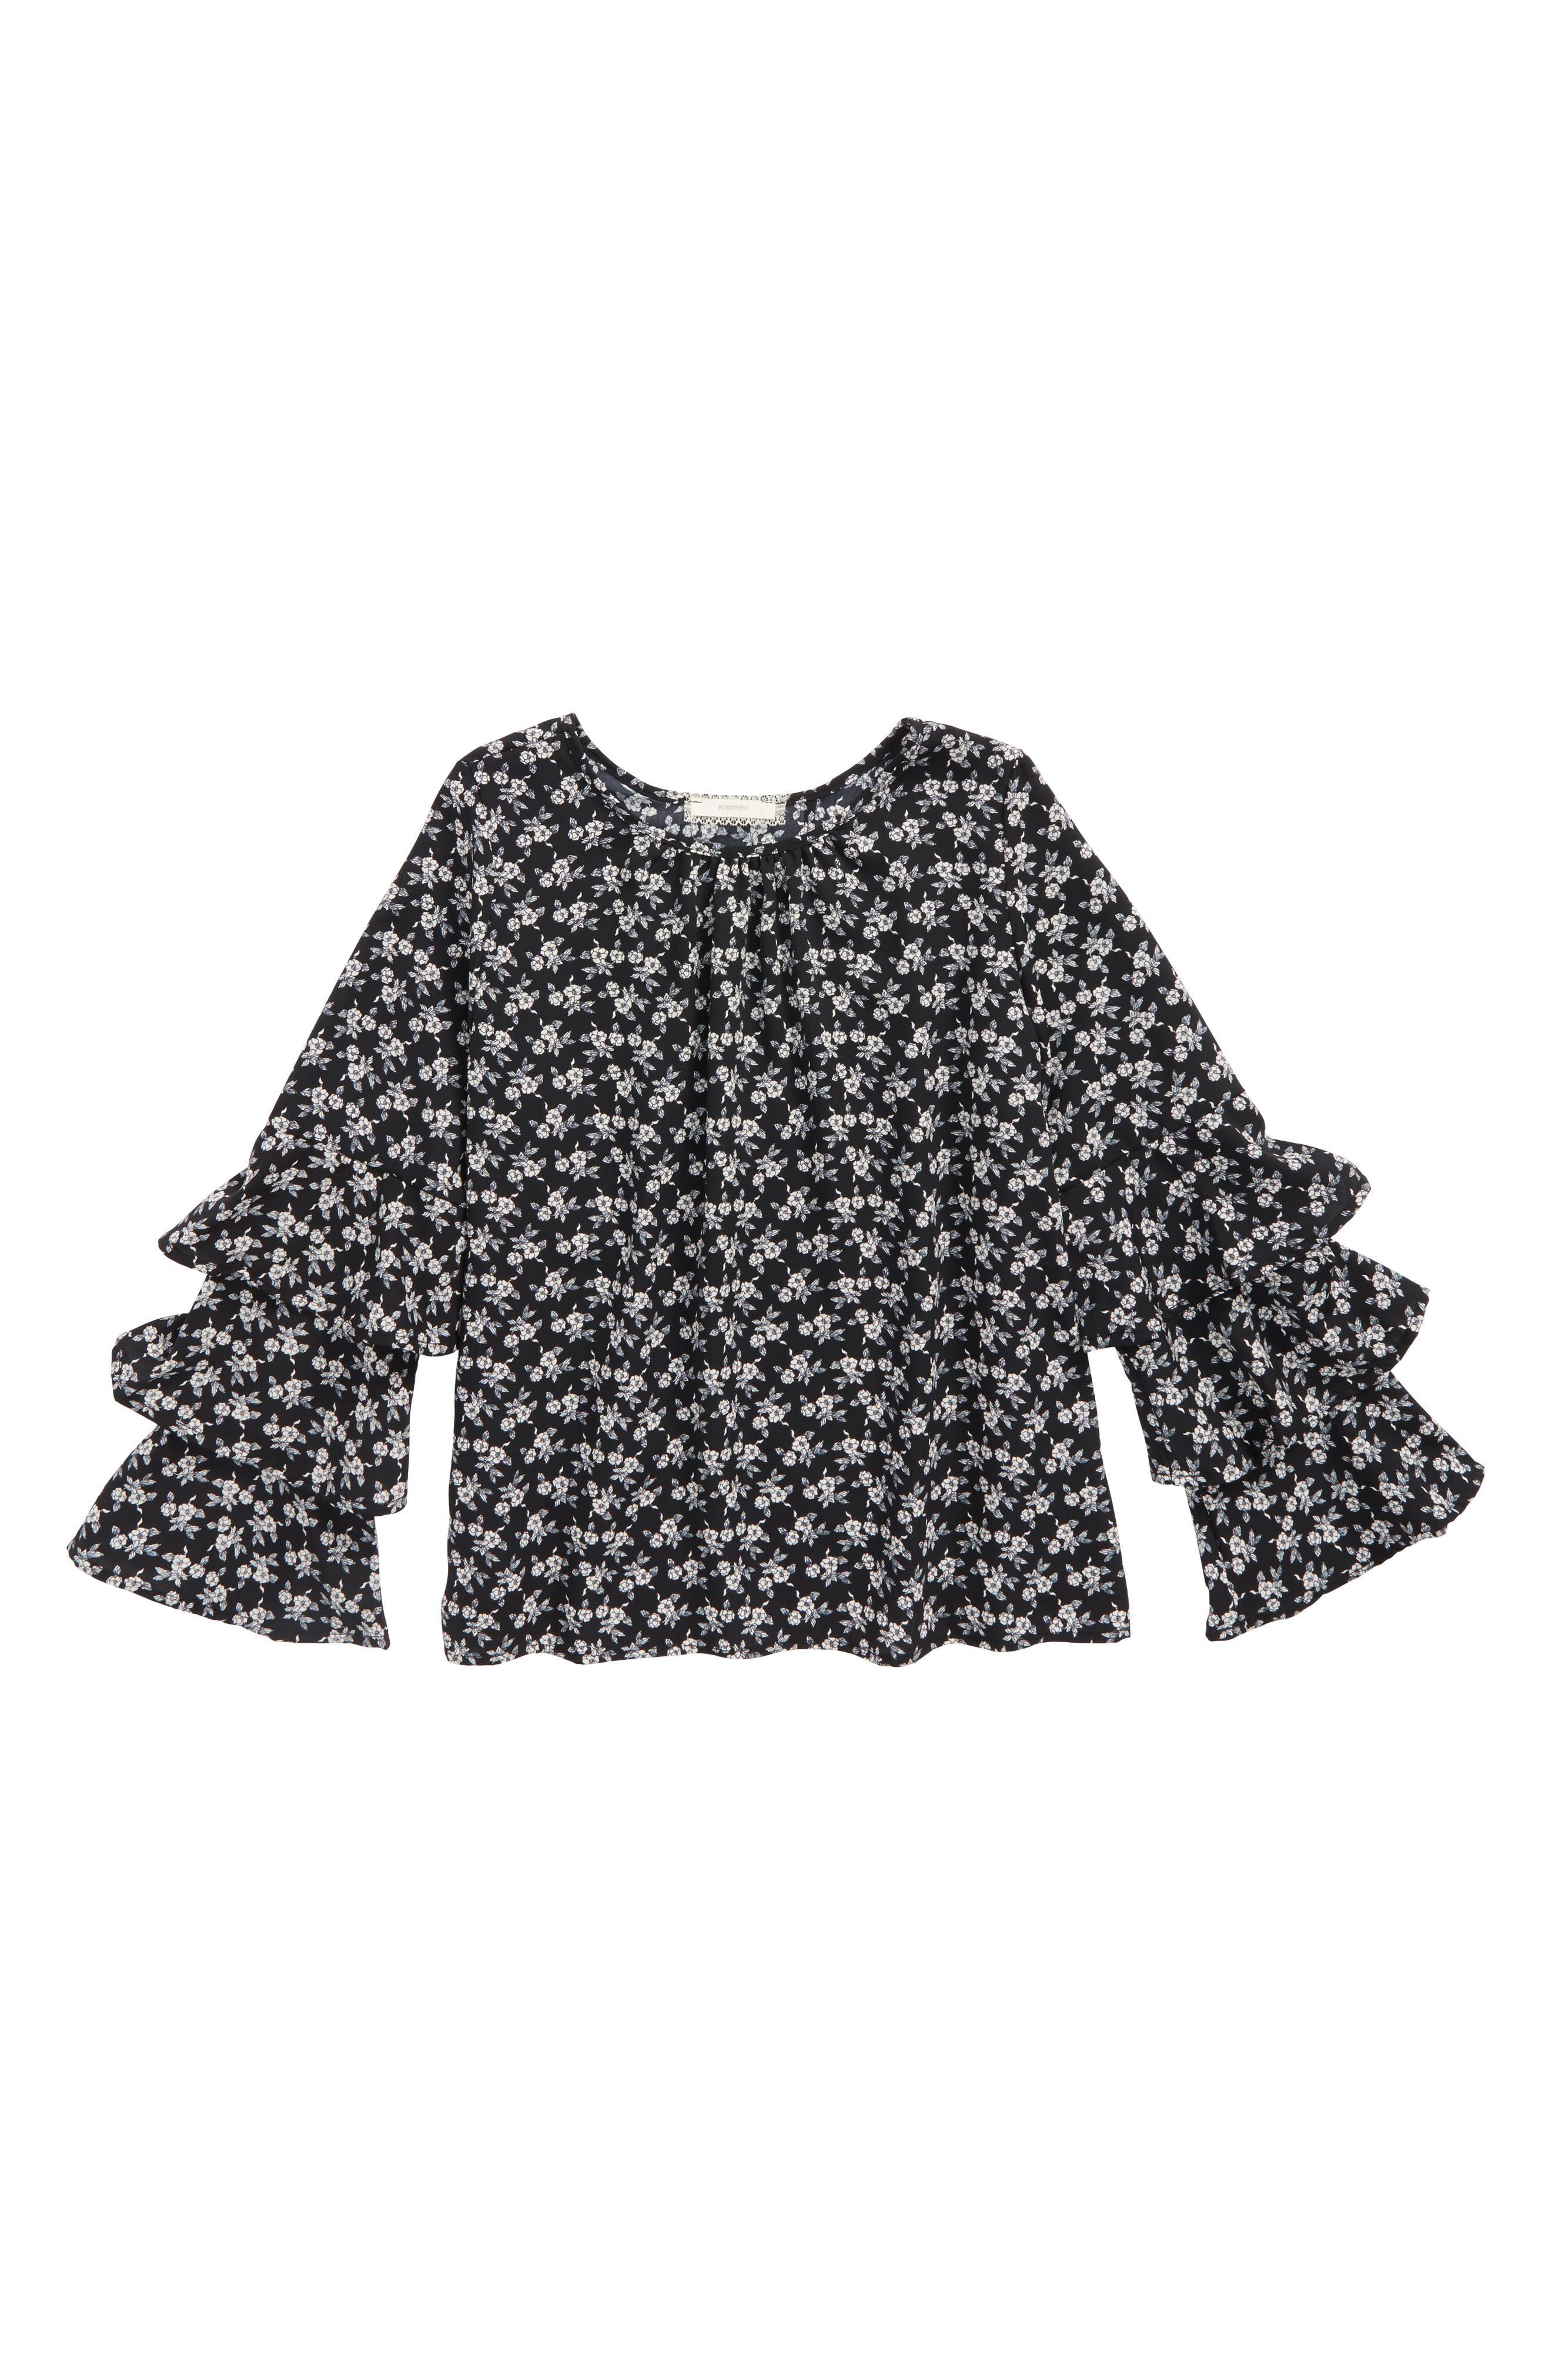 Pretty Woven Top,                             Main thumbnail 1, color,                             Black/ Wht Per Sample